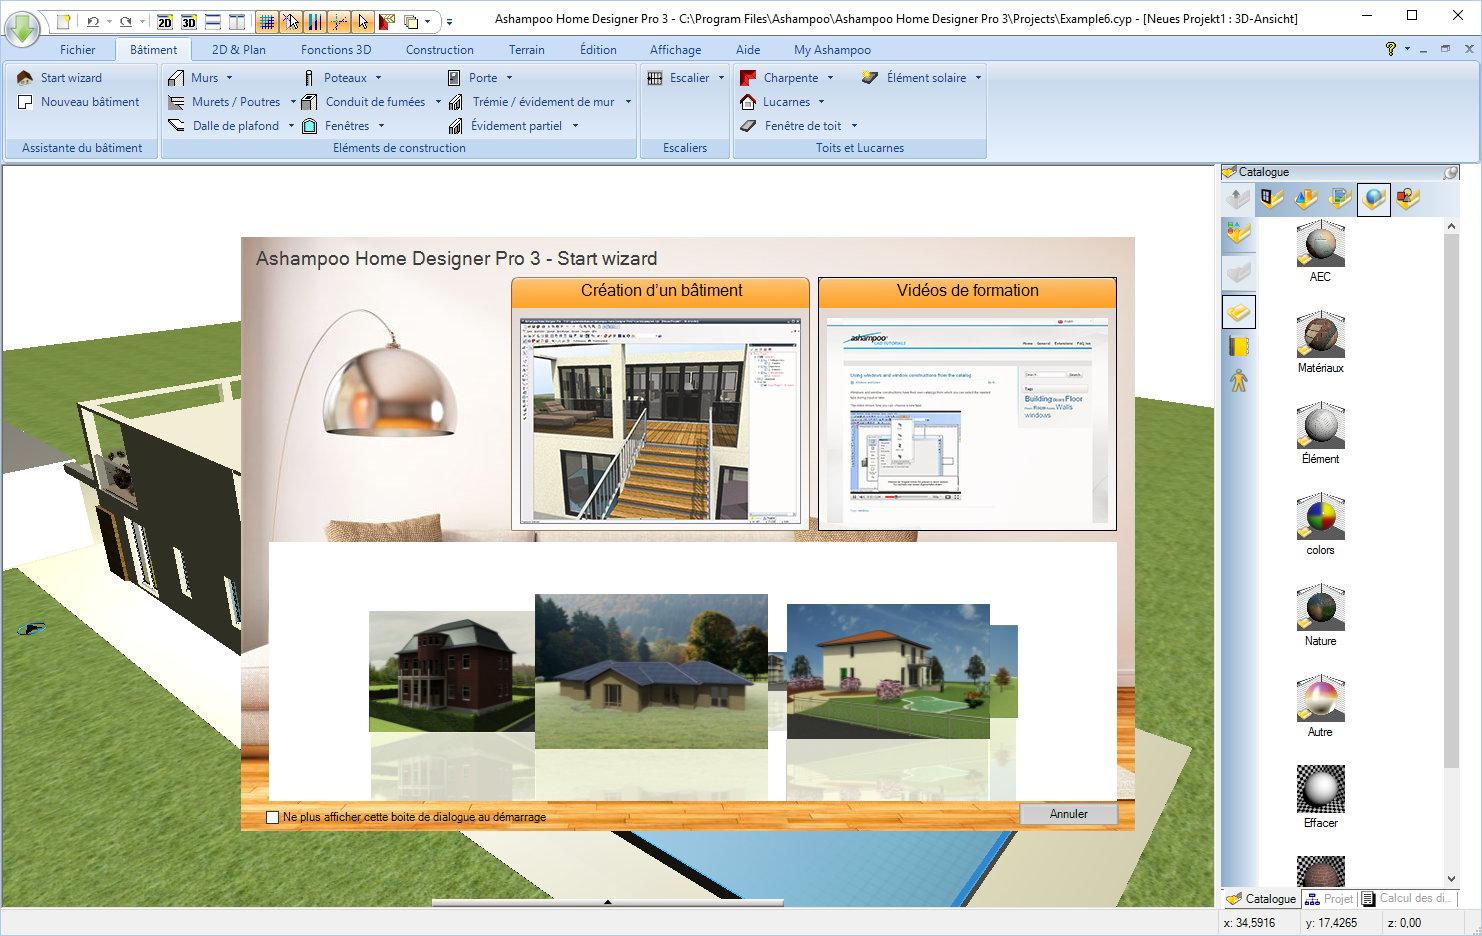 92+ Home Designer Pro Plans - Home Design Software For Architects ...